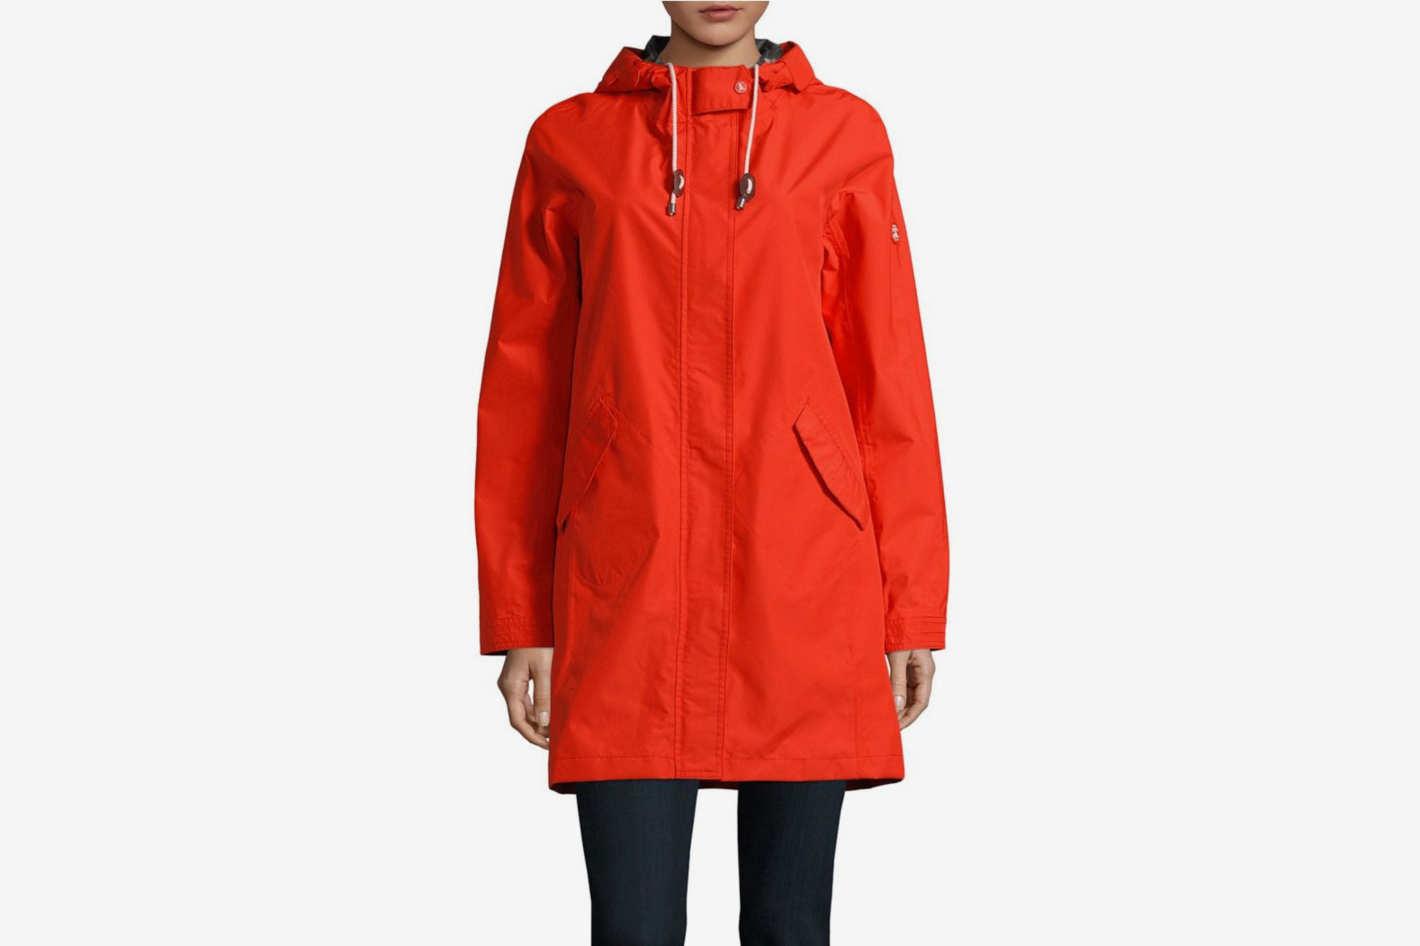 Barbour Drawstring Hooded Jacket